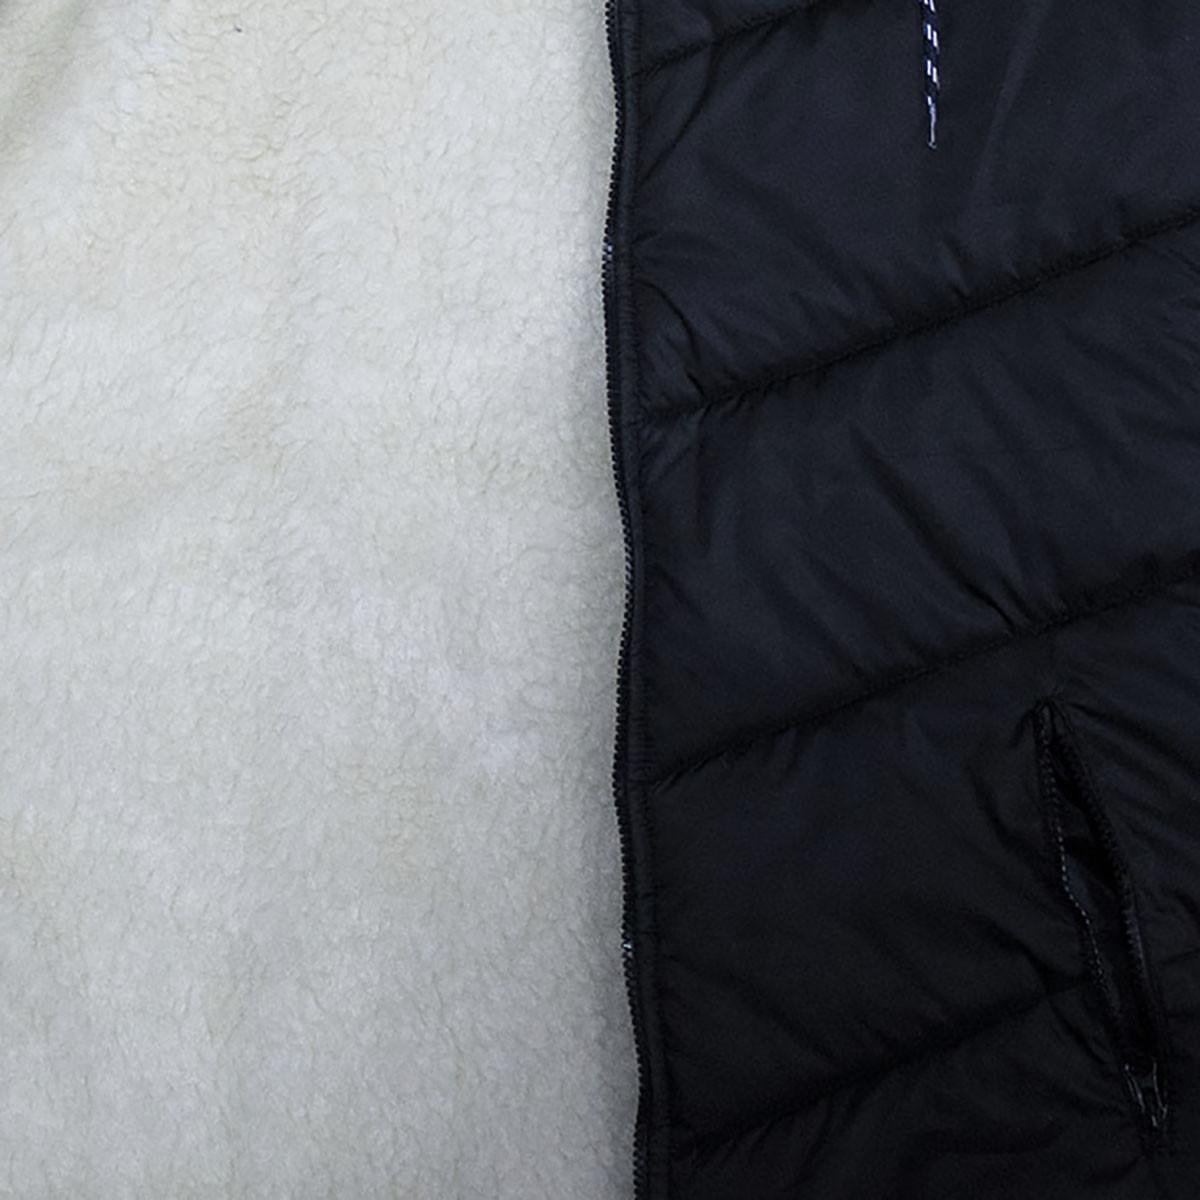 a1c24e1c59f3c Зимние мужские куртки на овчине фабричный пошив пр-во Украина E832H , цена  560 грн., купить в Одессе — Prom.ua (ID#587435432)